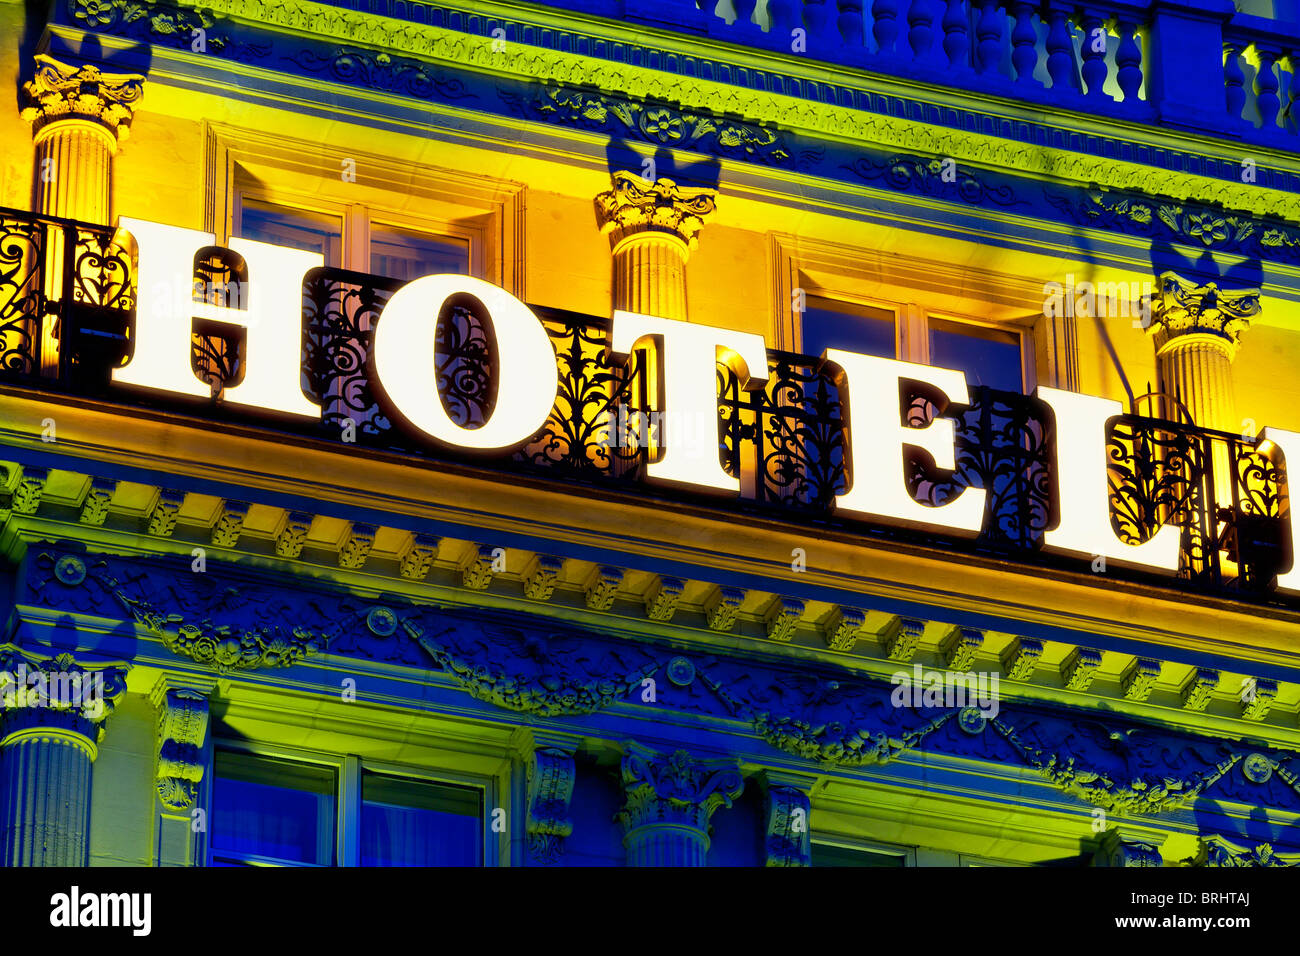 France, Paris, Hotel Sign Stock Photo